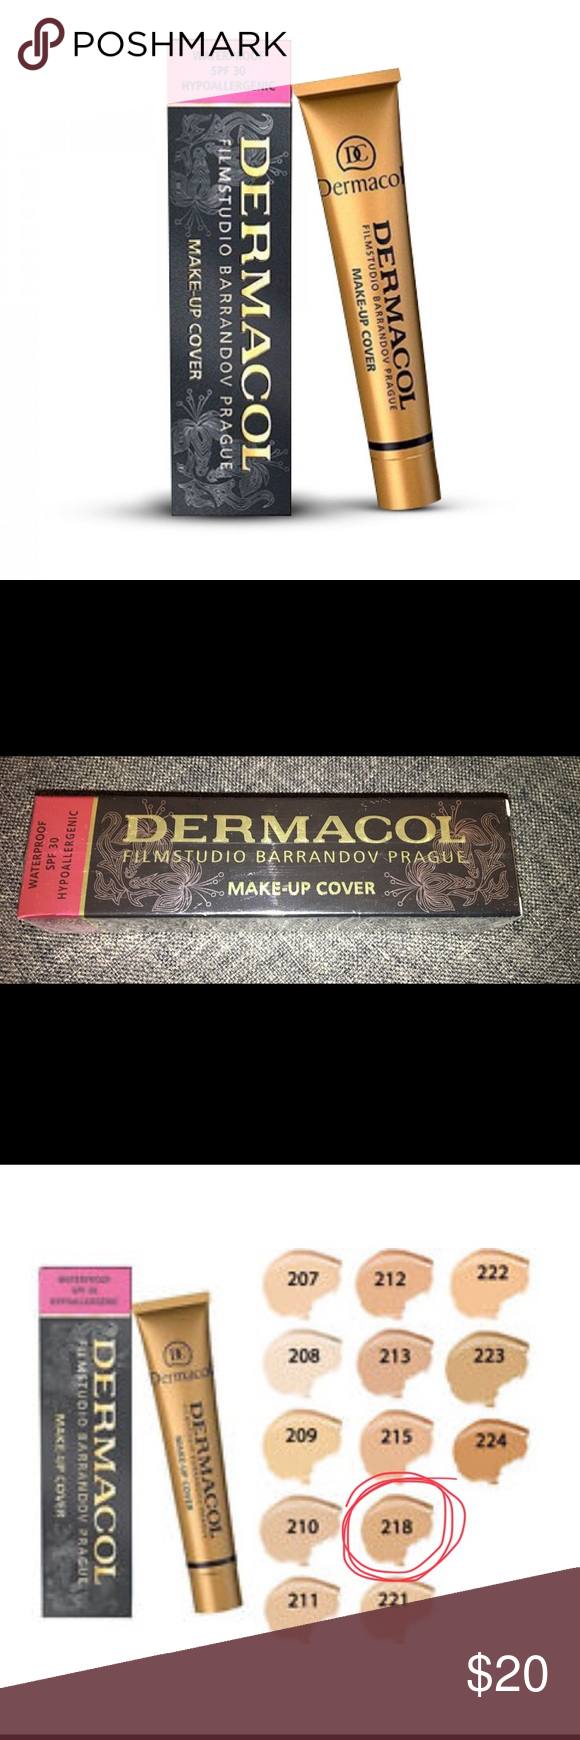 Dermacol make up cover Dermacol make up cover shade 218